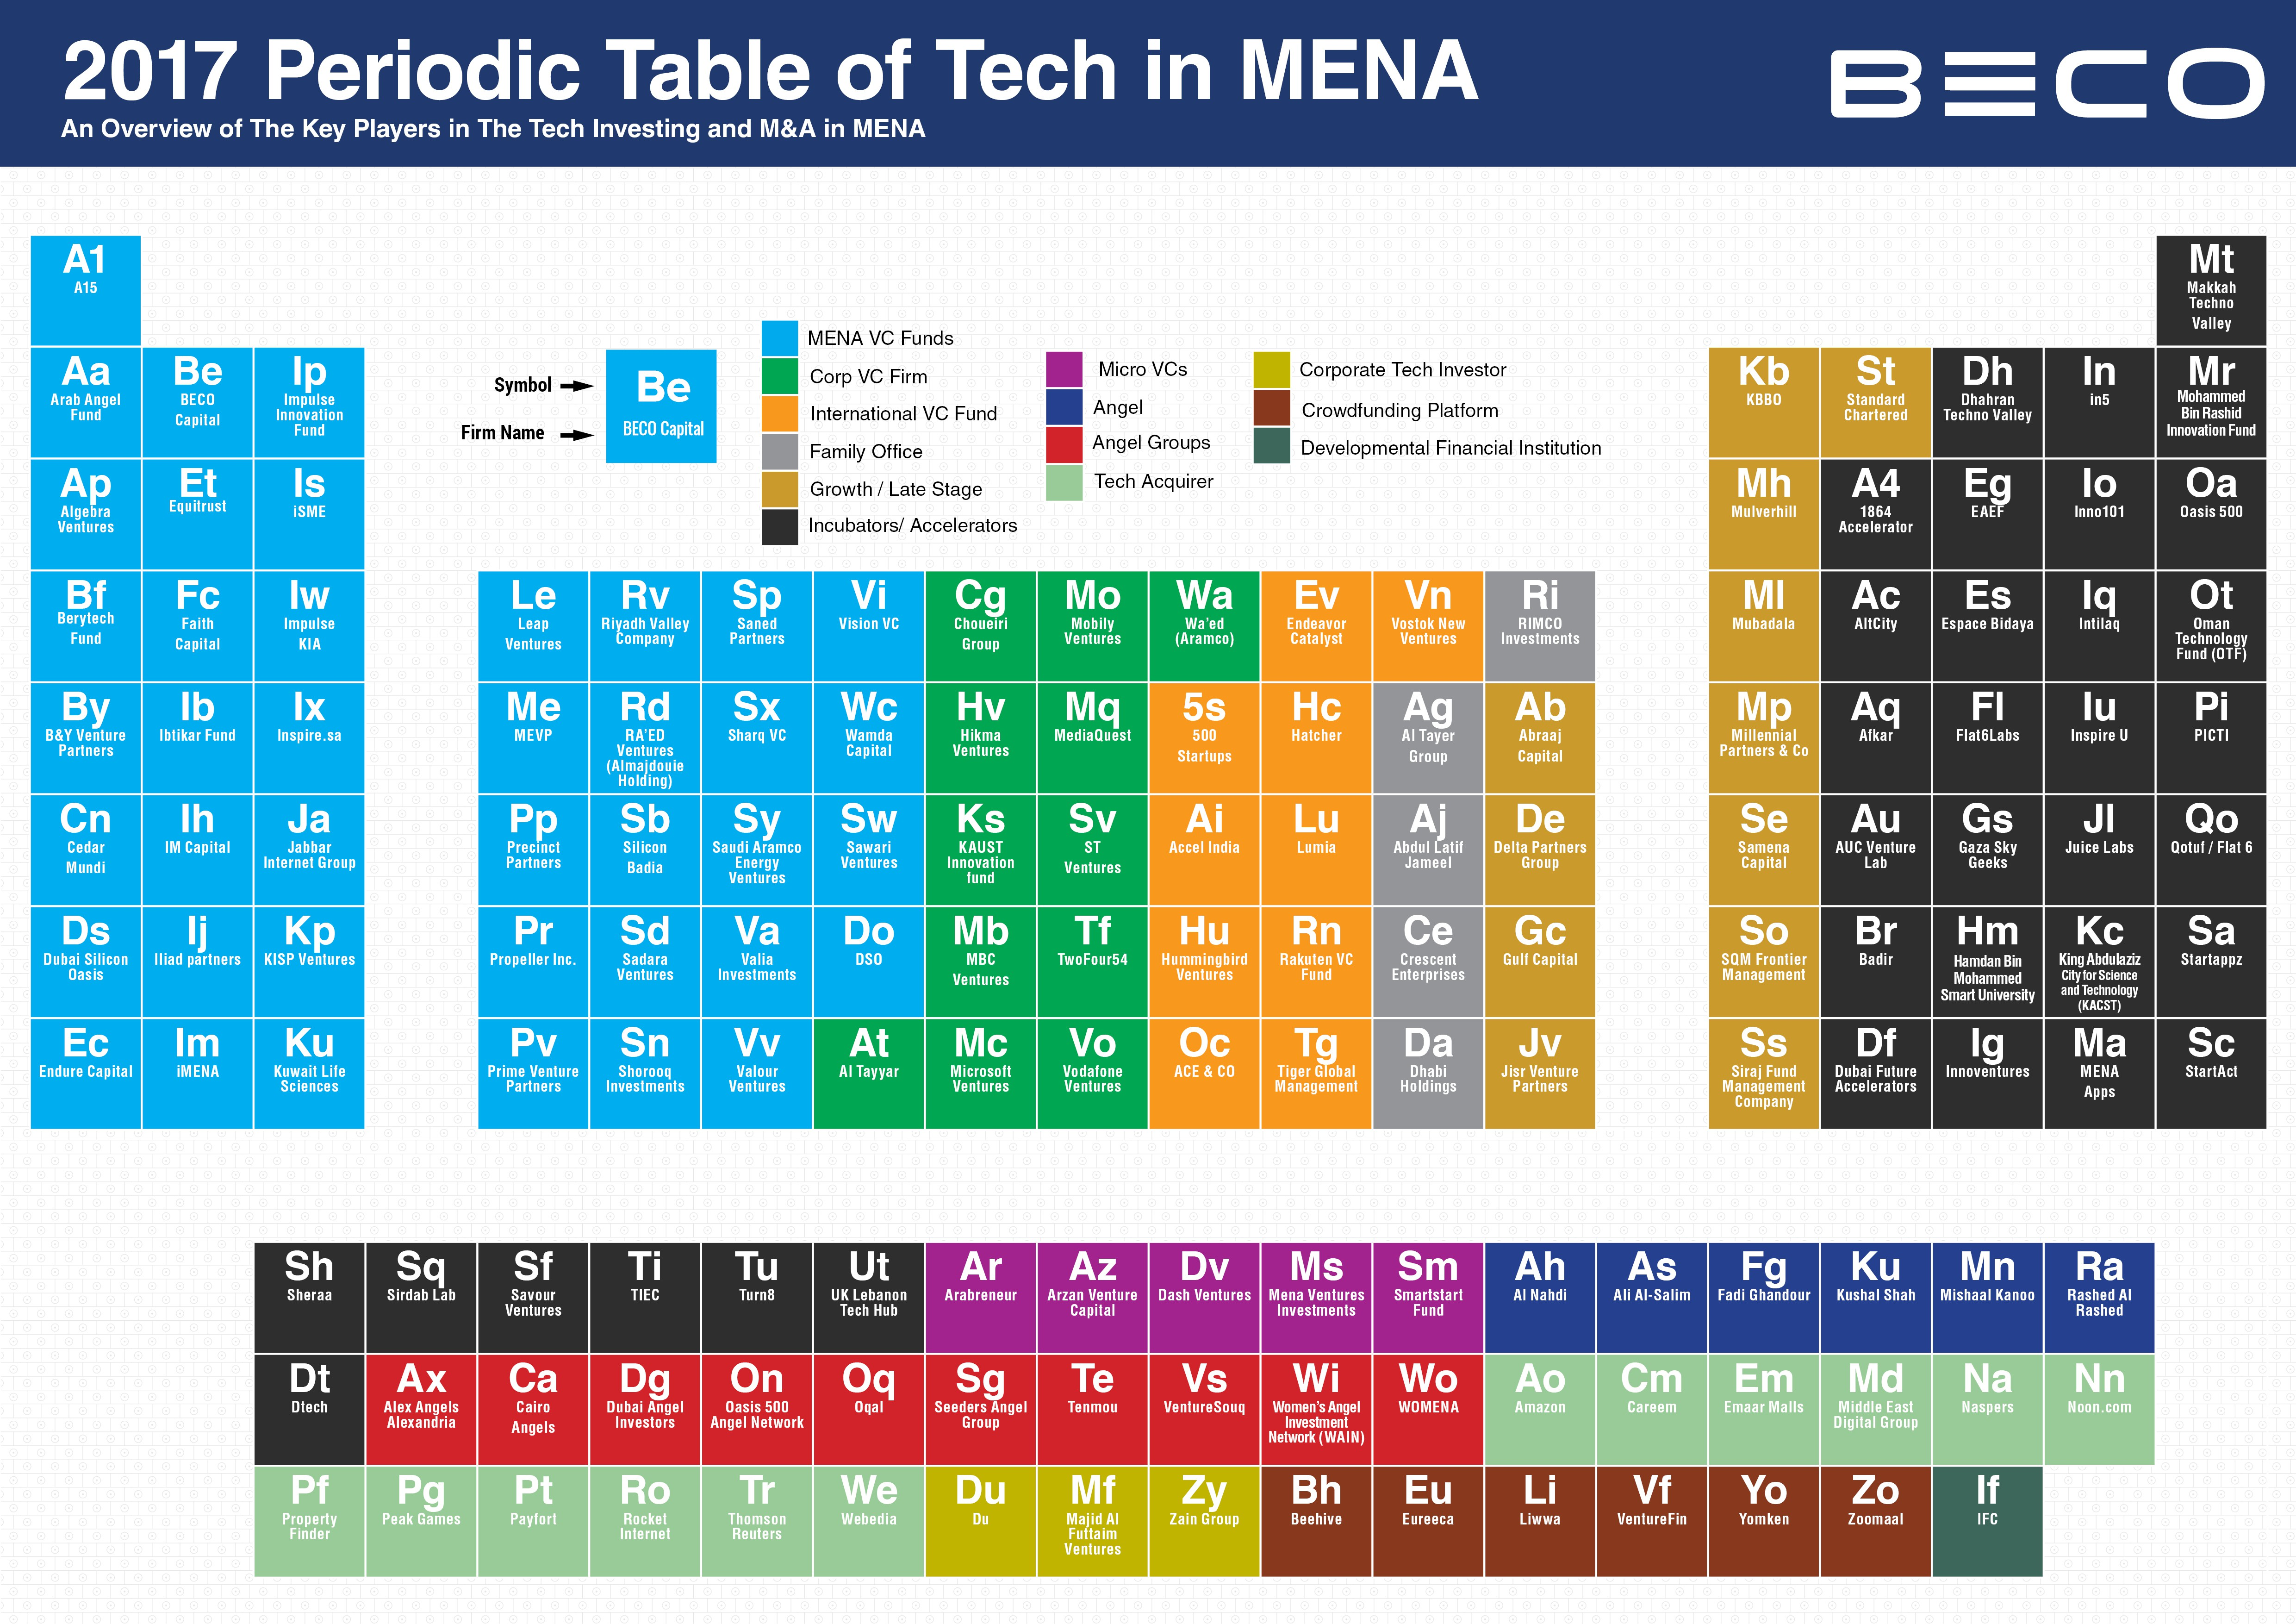 BECO 2017 Periodic Table